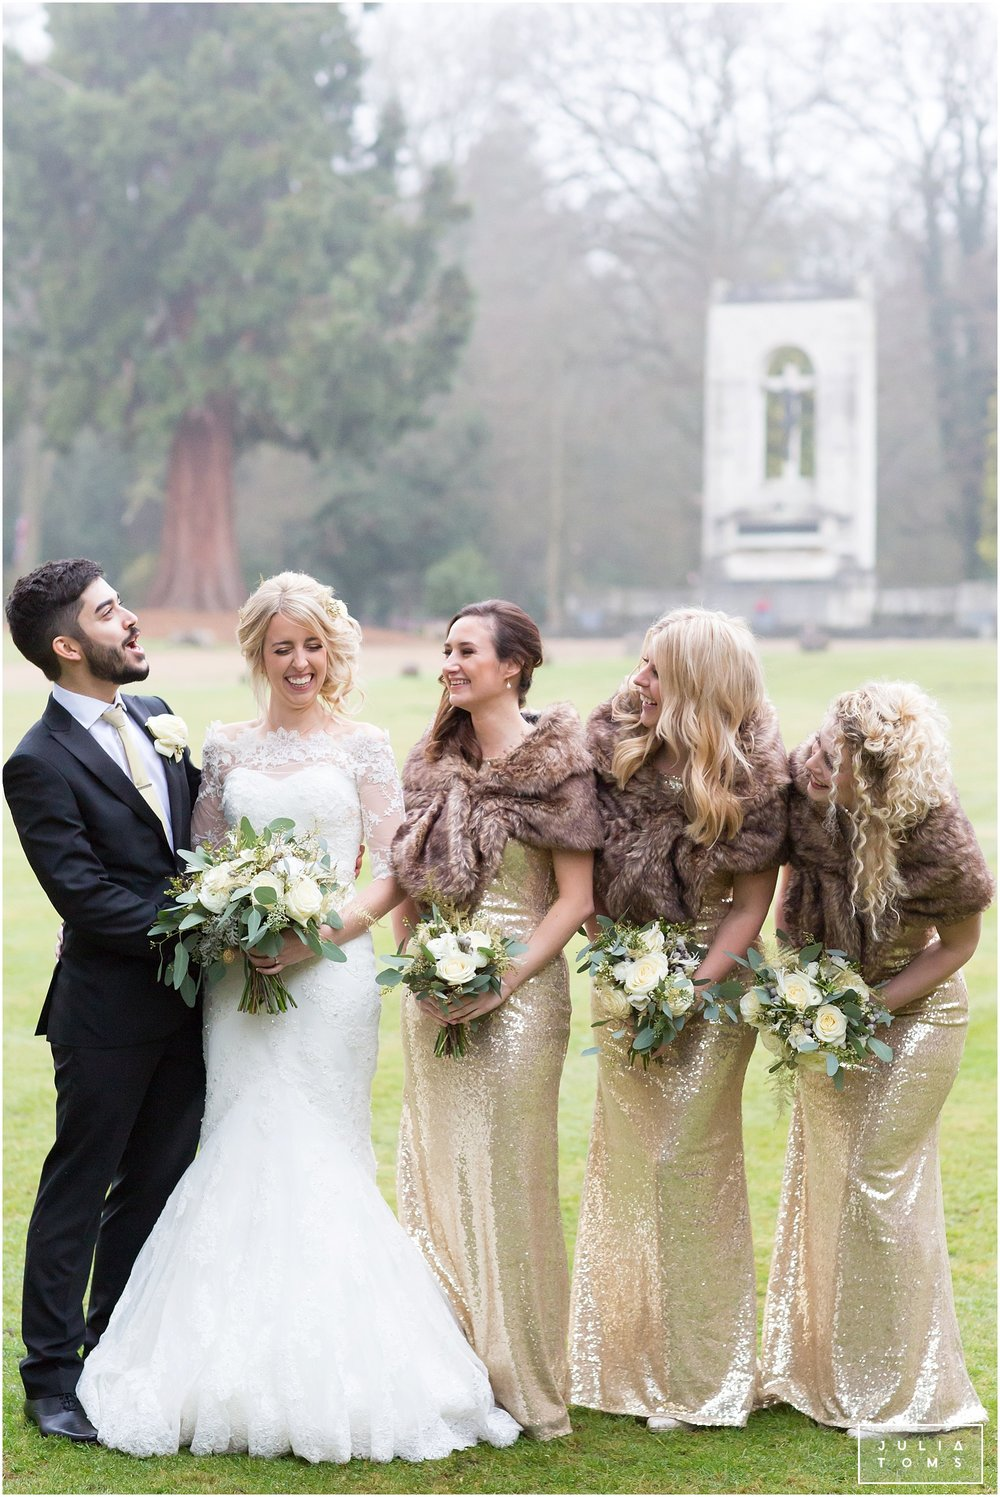 julia_toms_beaumont_estate_wedding_photography_windsor_020.jpg